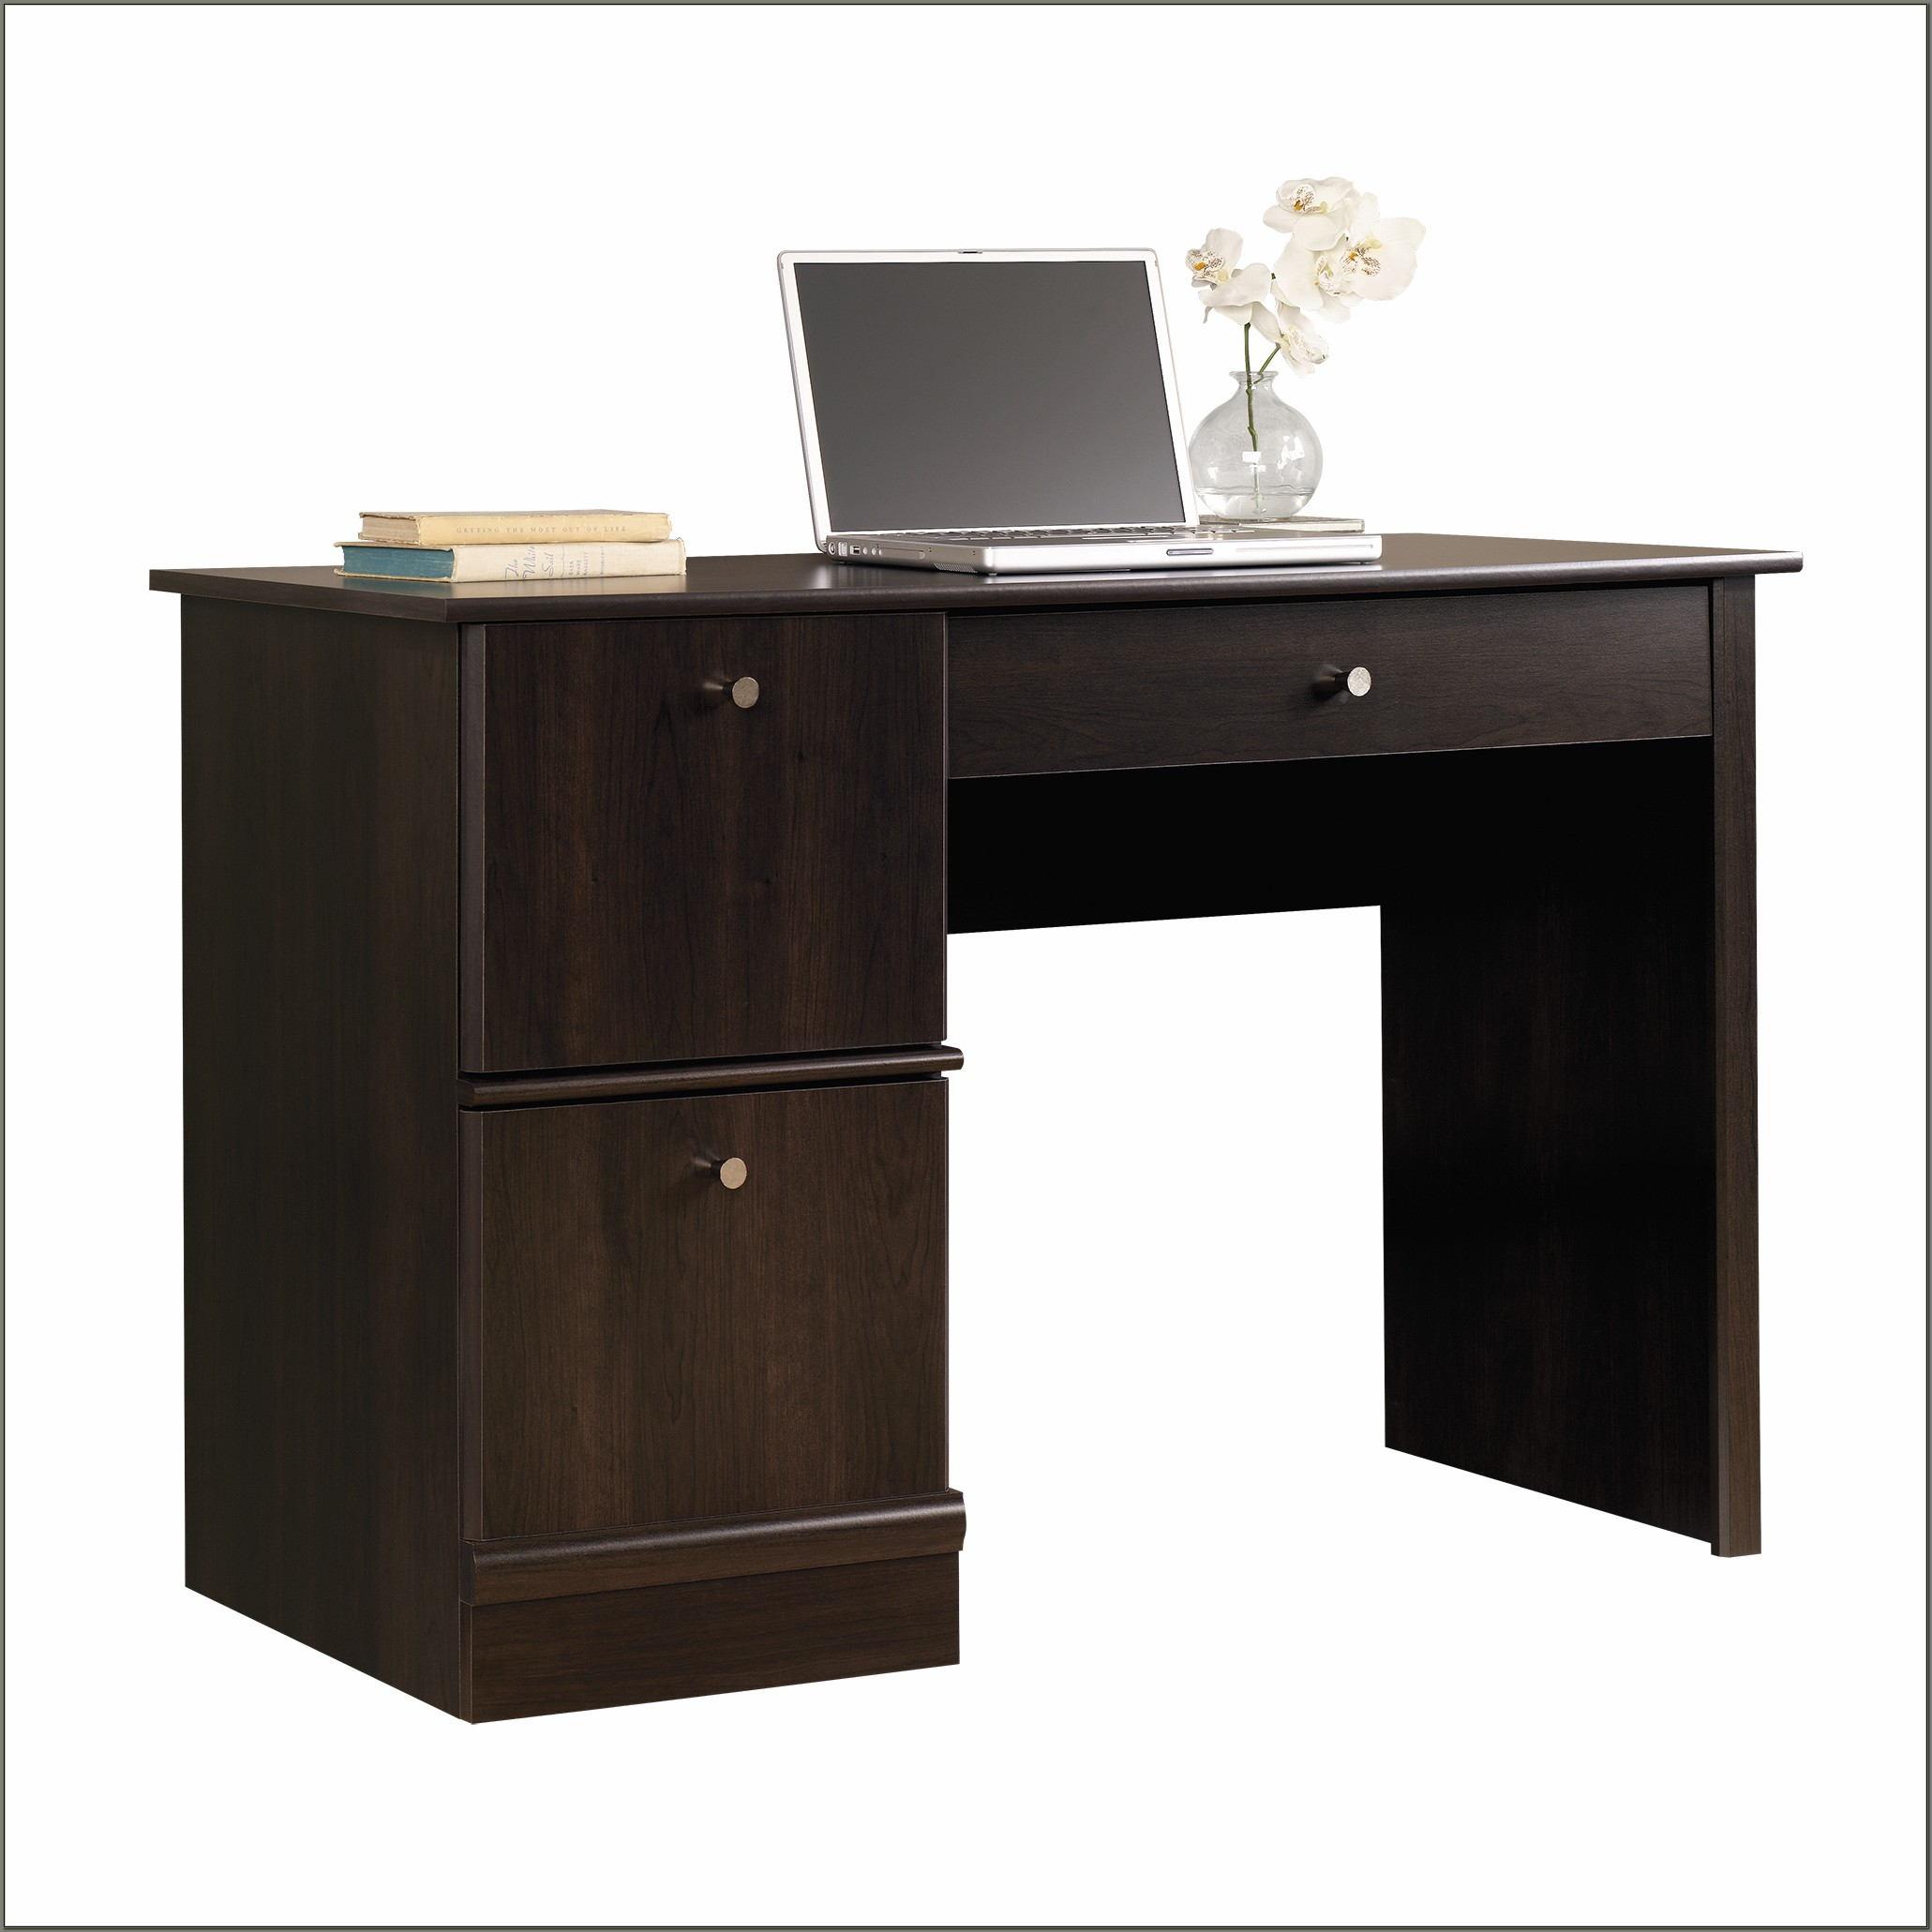 Sauder Cherry Computer Desk